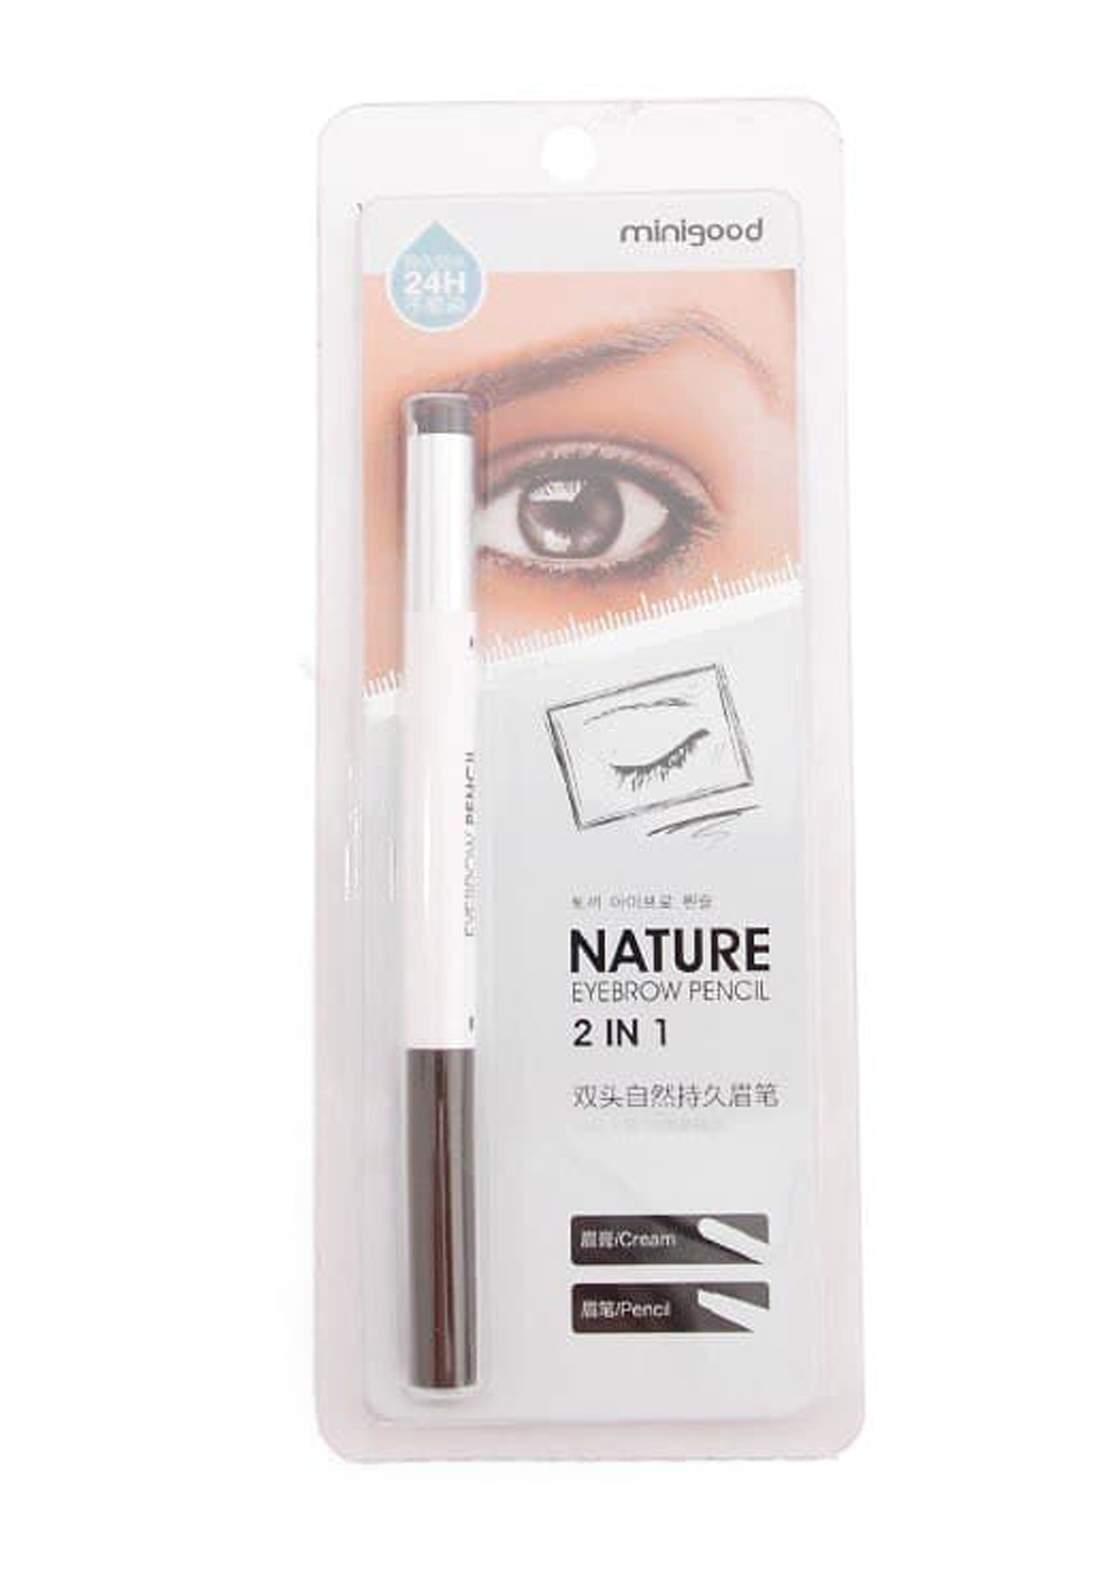 Minigood Nature Eyebrow Pencil 2in1 No.19 قلم تحديد الحواجب